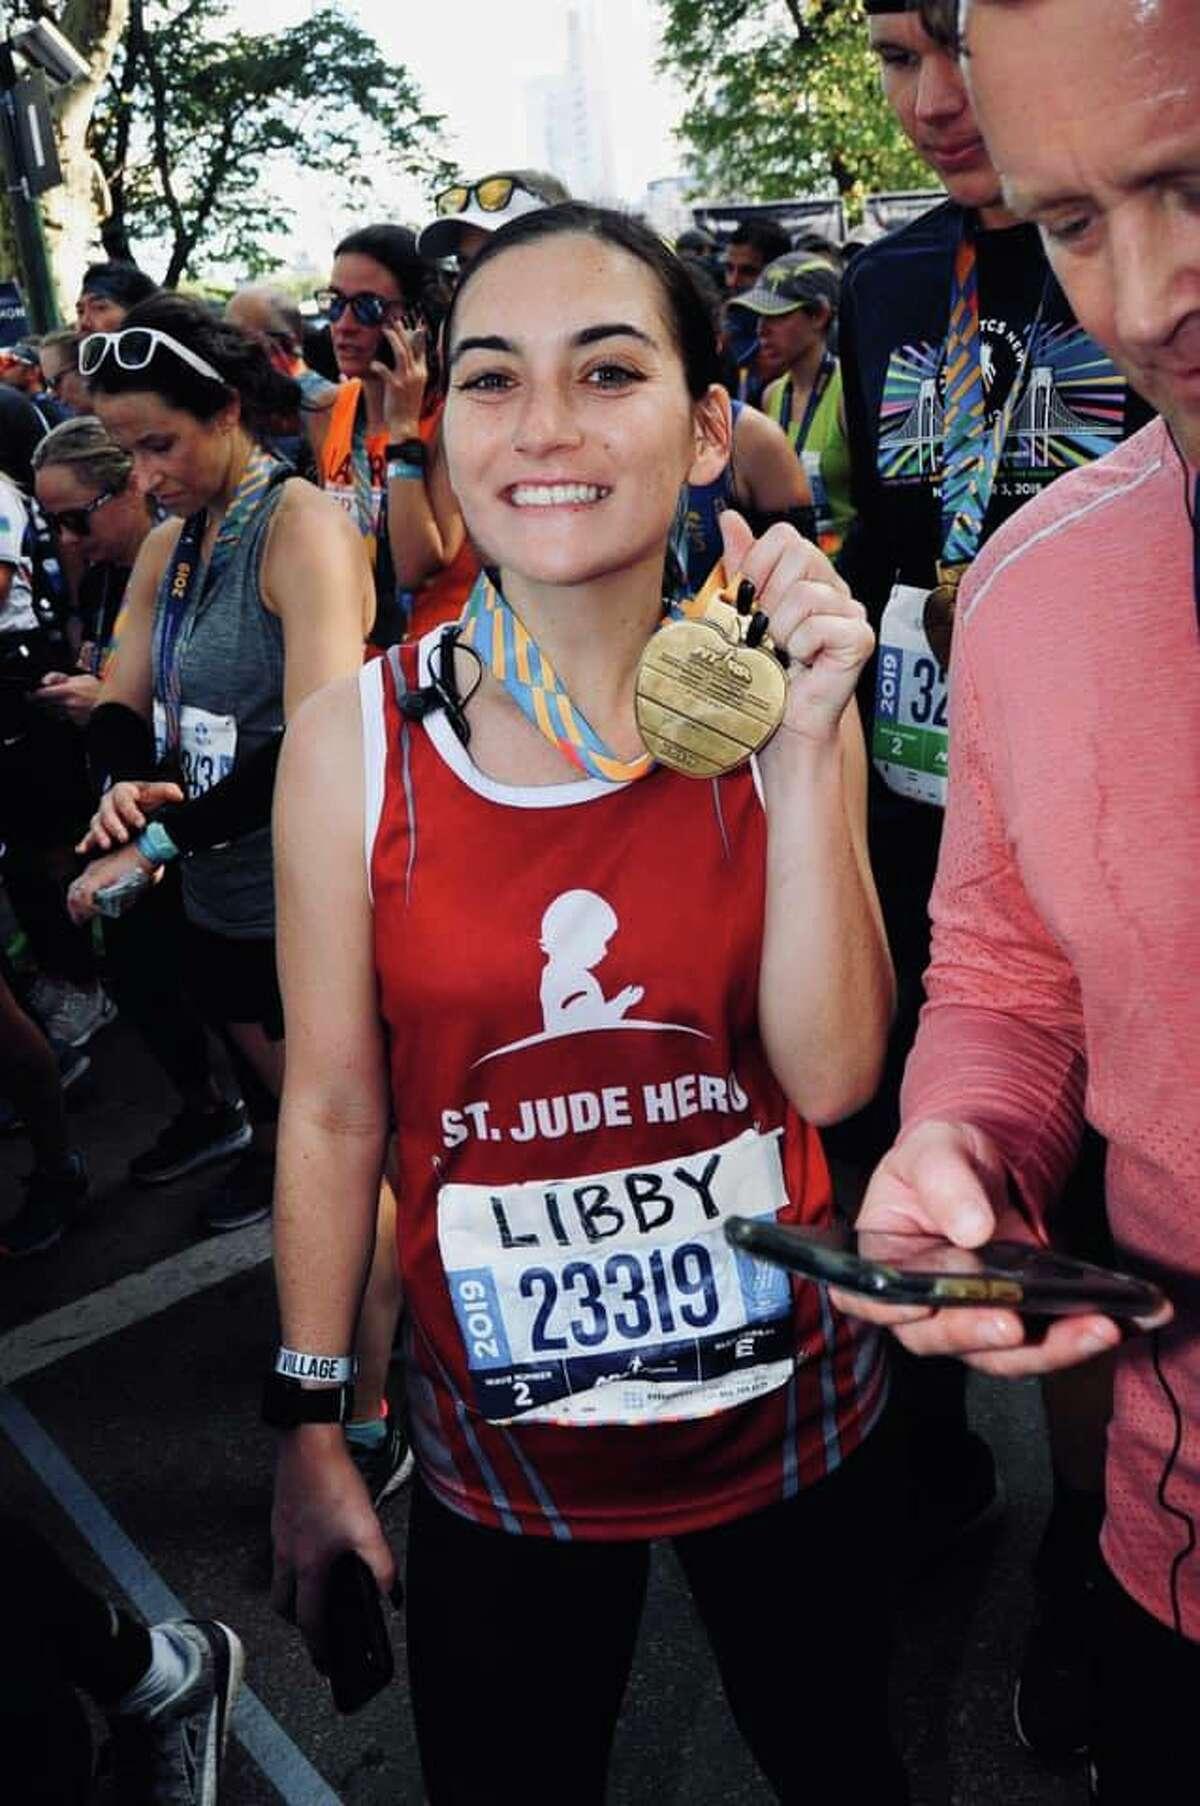 2. I've run three half marathons and two full marathons, the latest being the New York City Marathon in 2019.